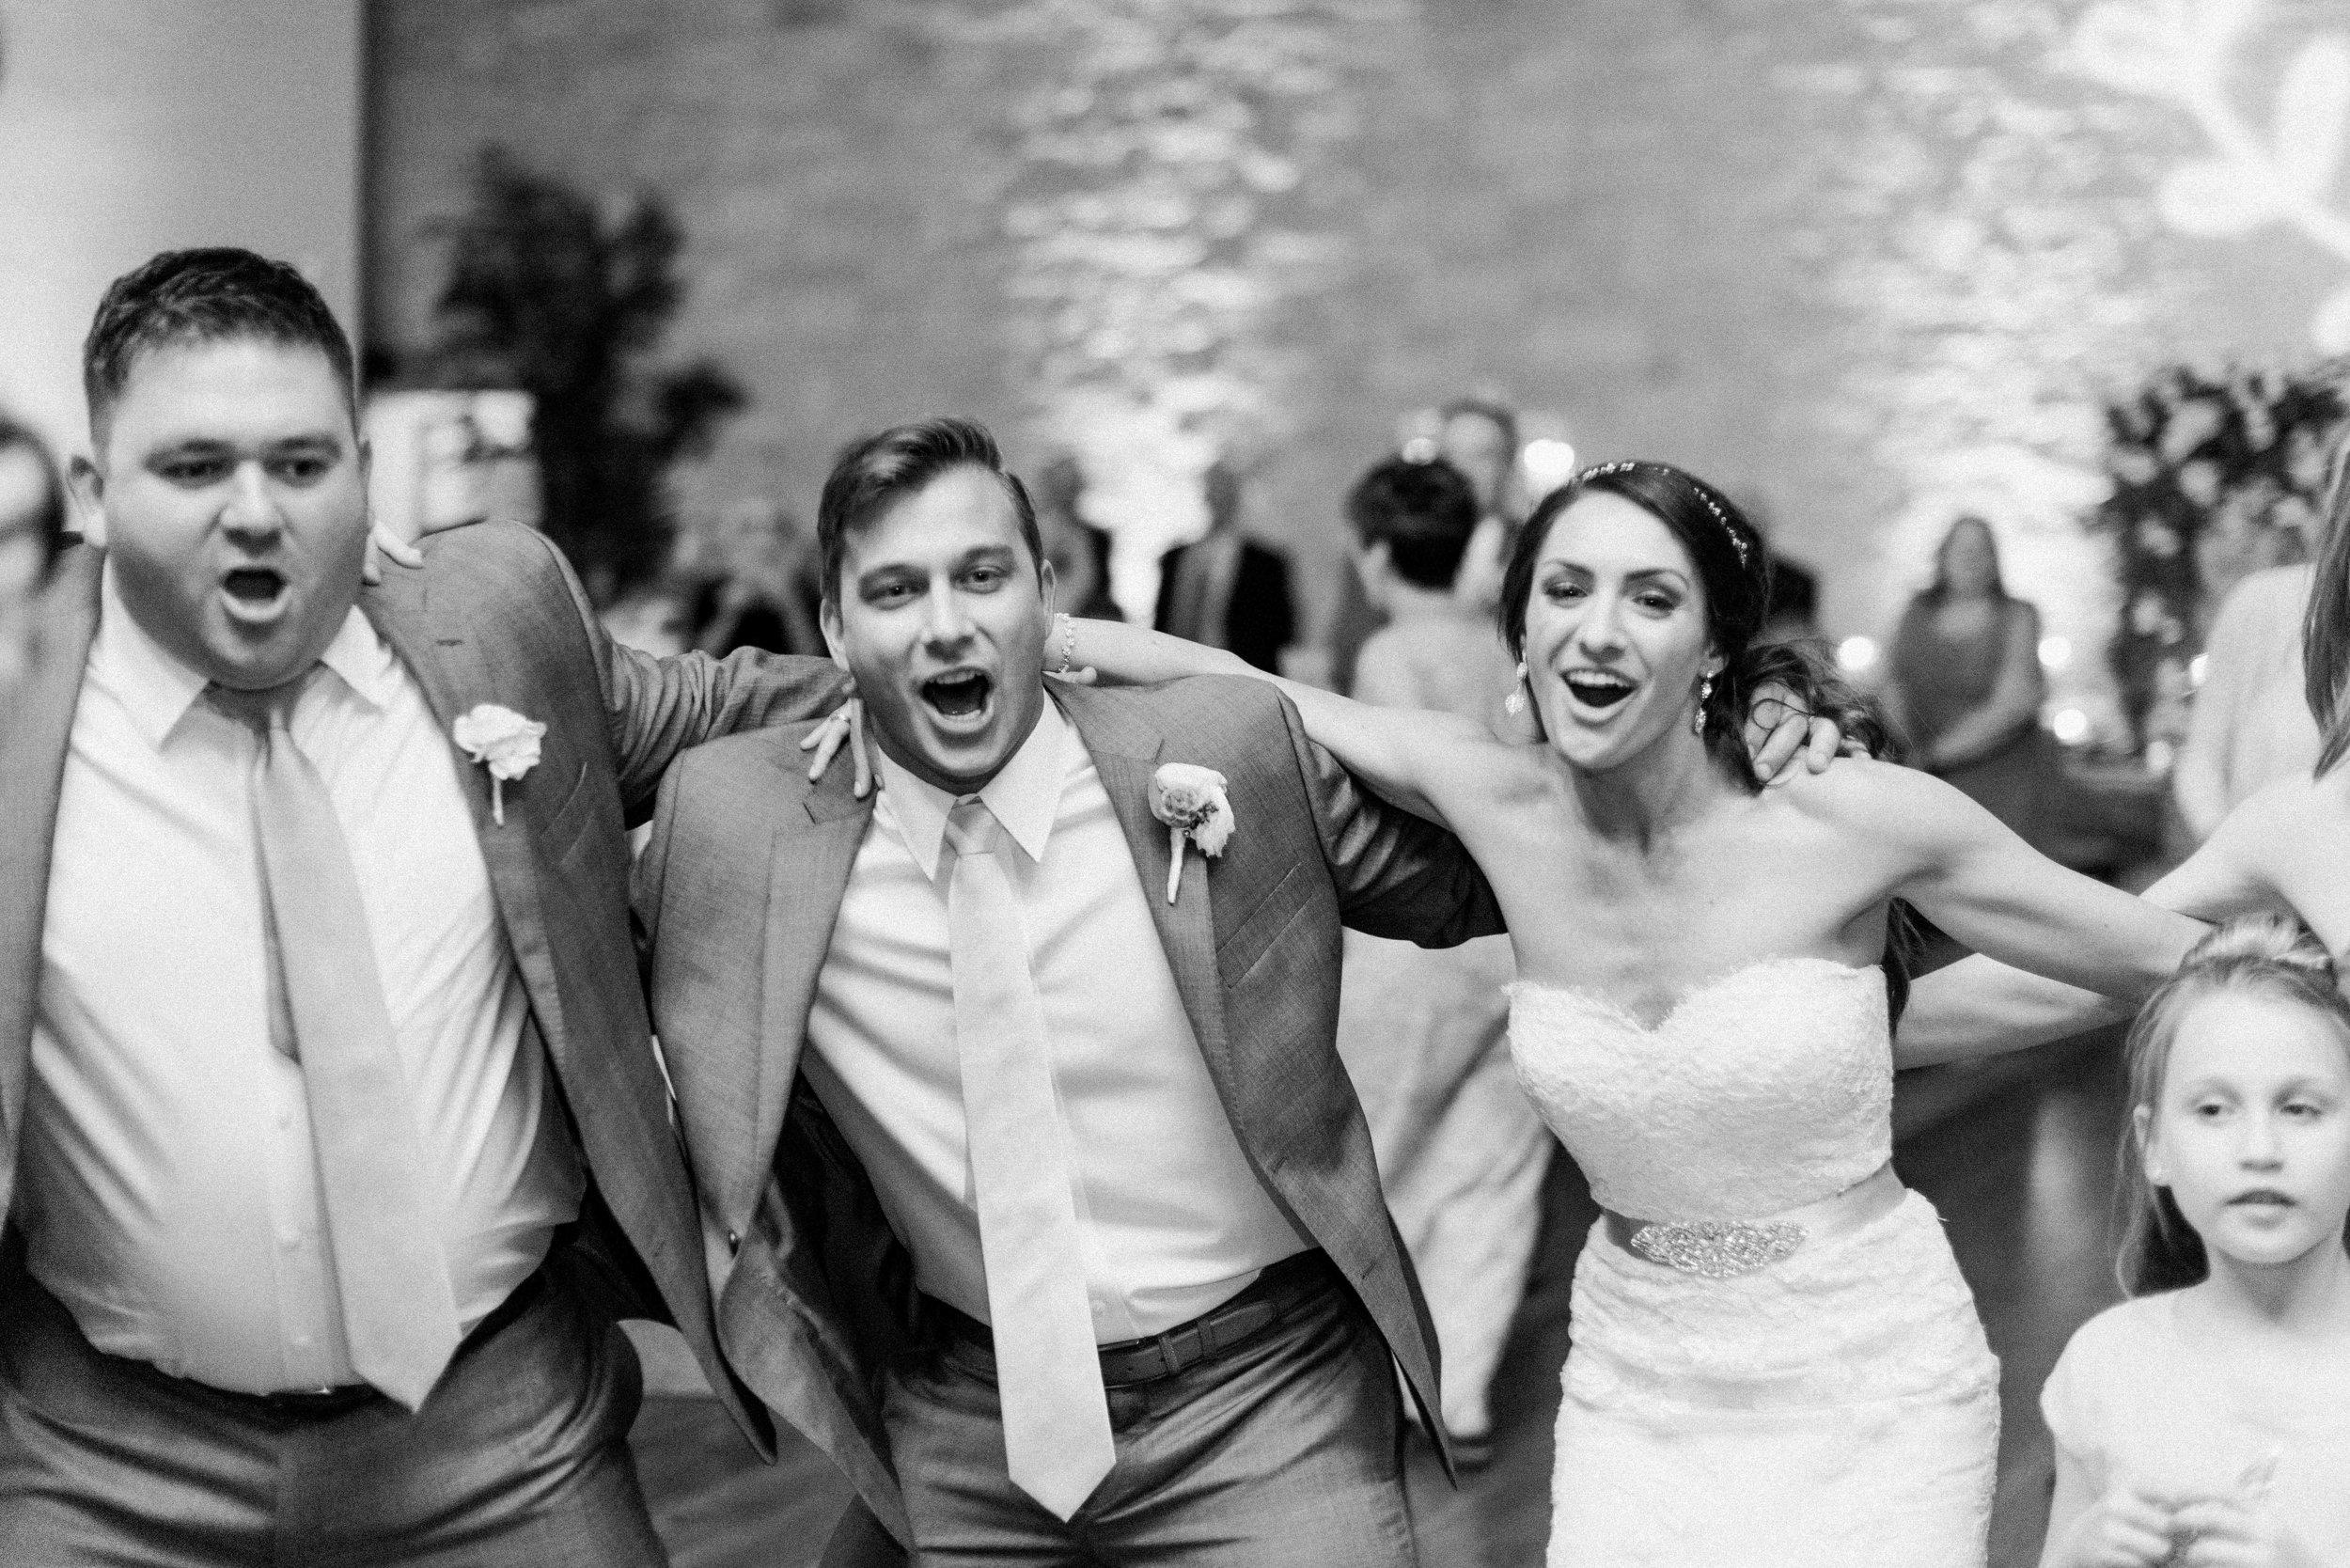 Briscoe-Manor-Houston-Wedding-Photographer-Modern-Luxury-Weddings-Dana-Fernandez-Photograpy-Fine-Art-Photographer-Houston-Film-Destination-PNW-Wedding-Photographer-18.jpg